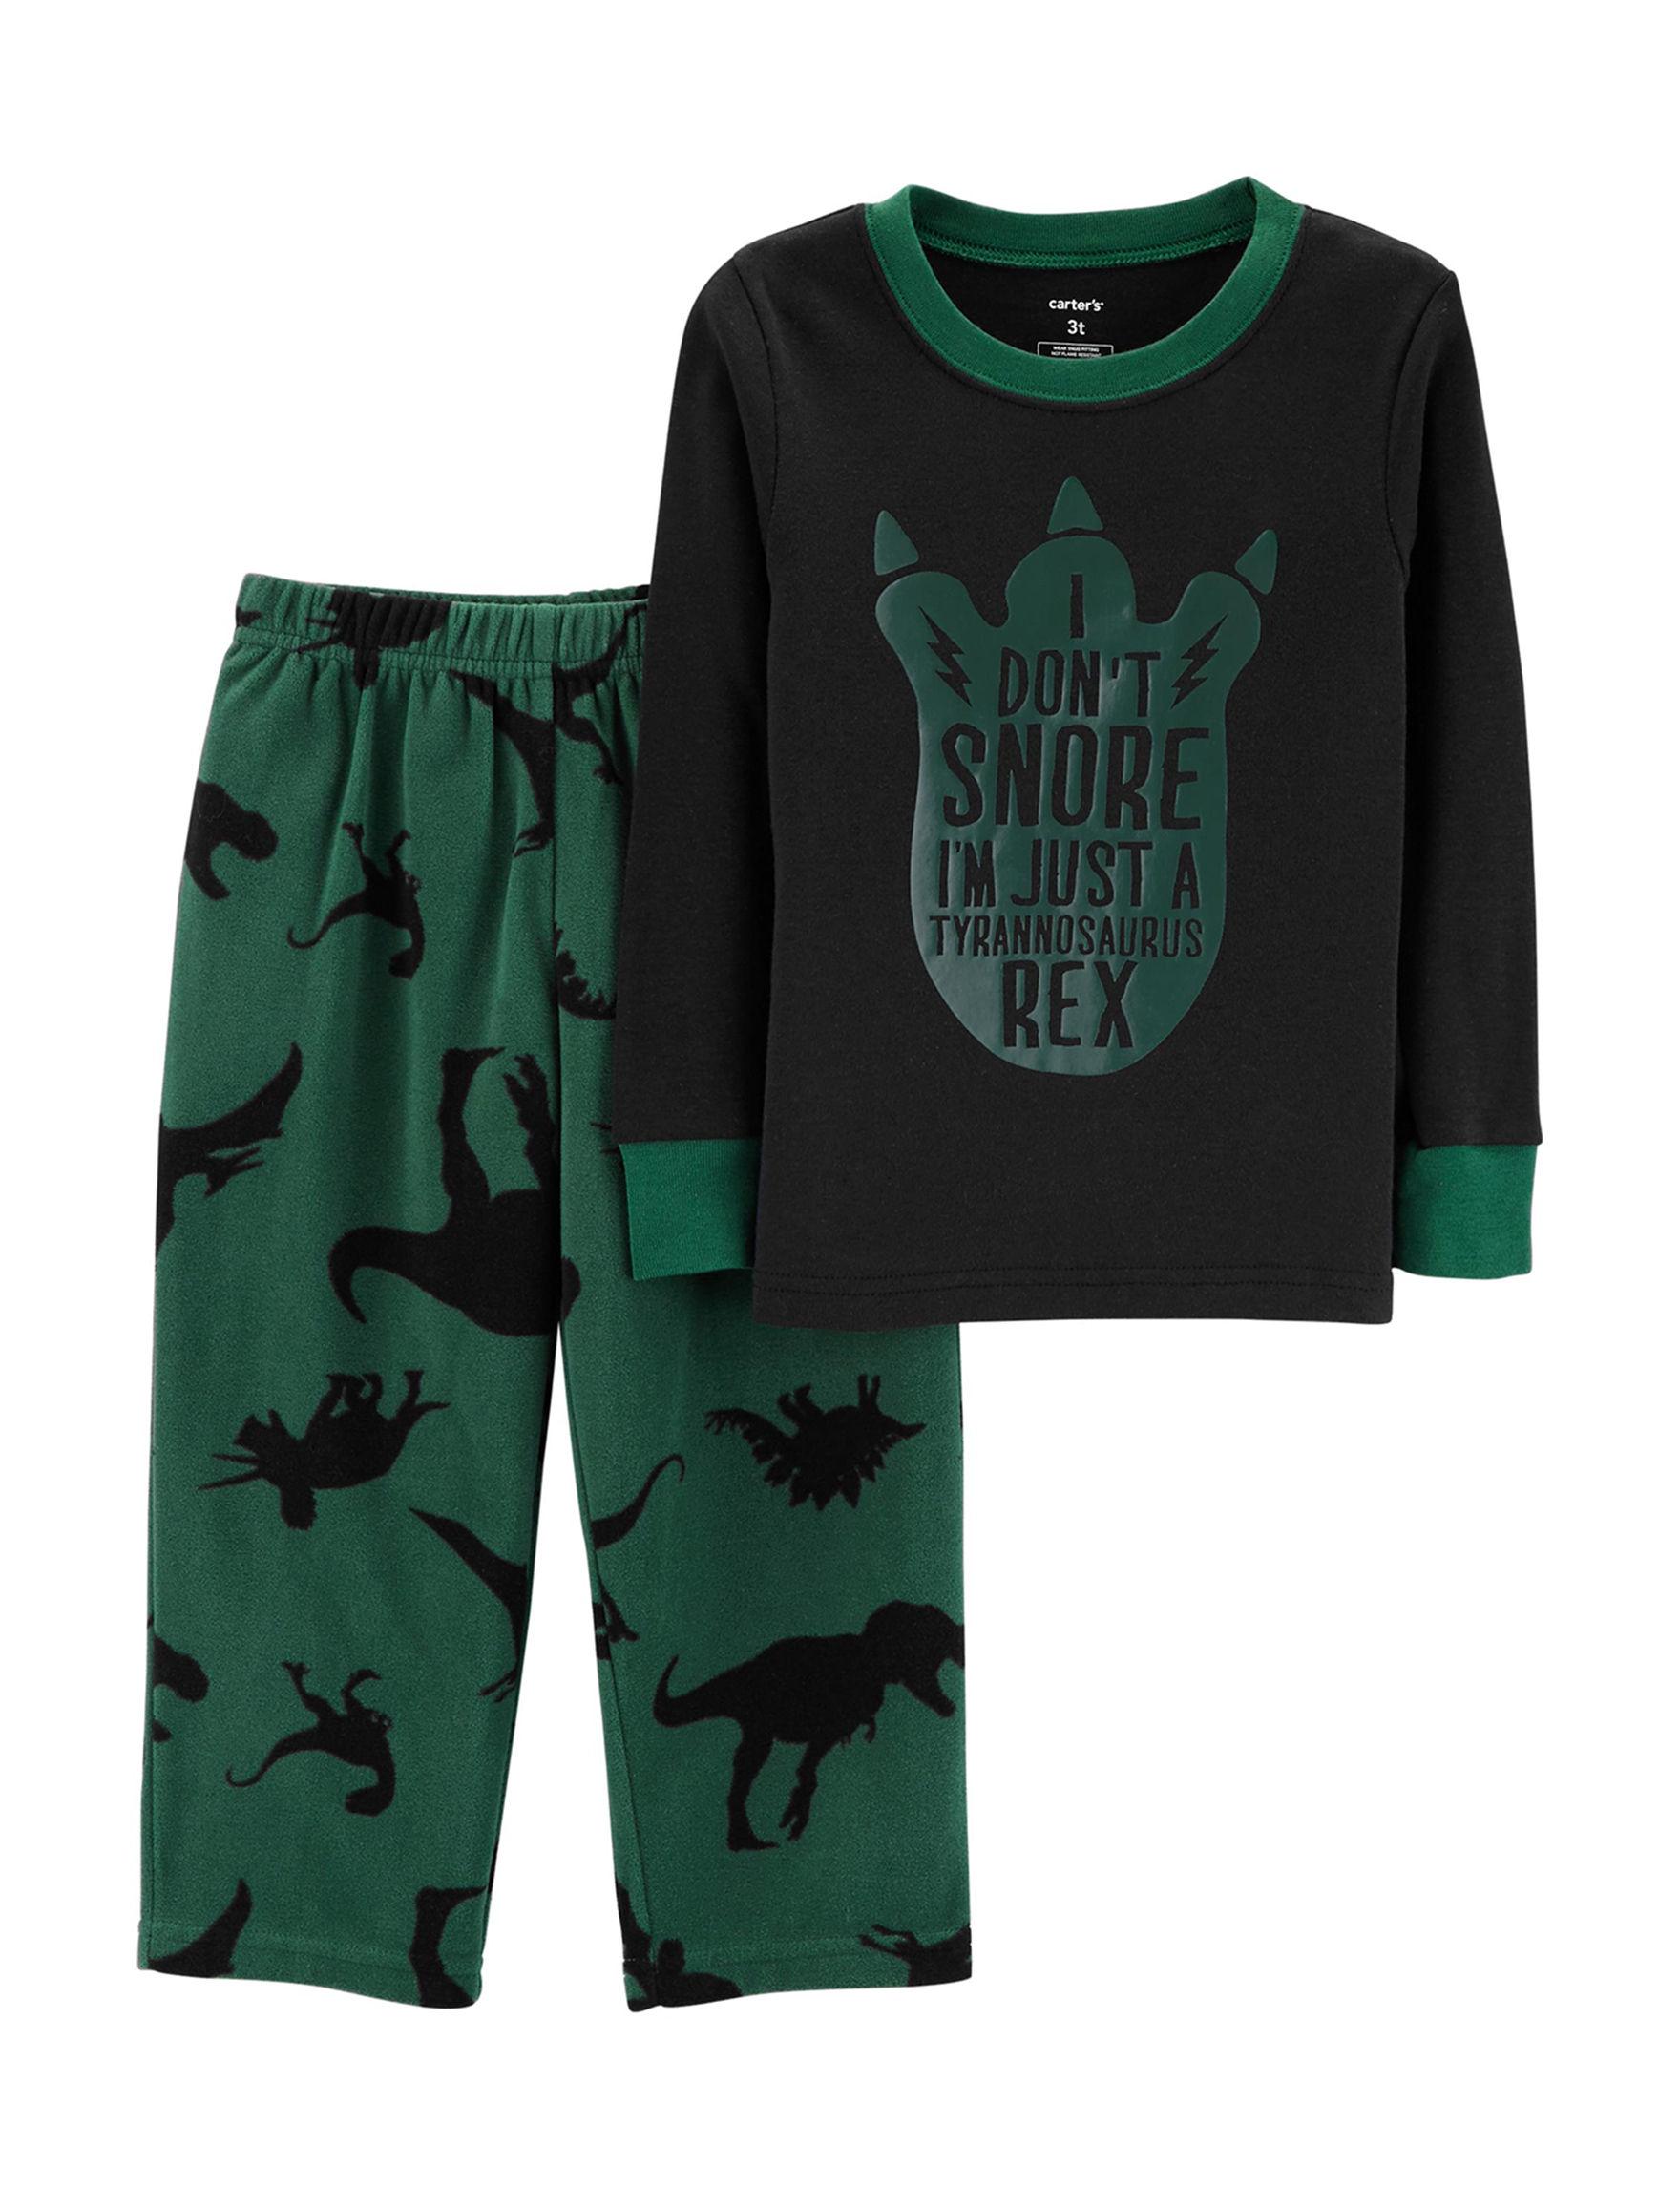 Carter's Black / Green Pajama Sets